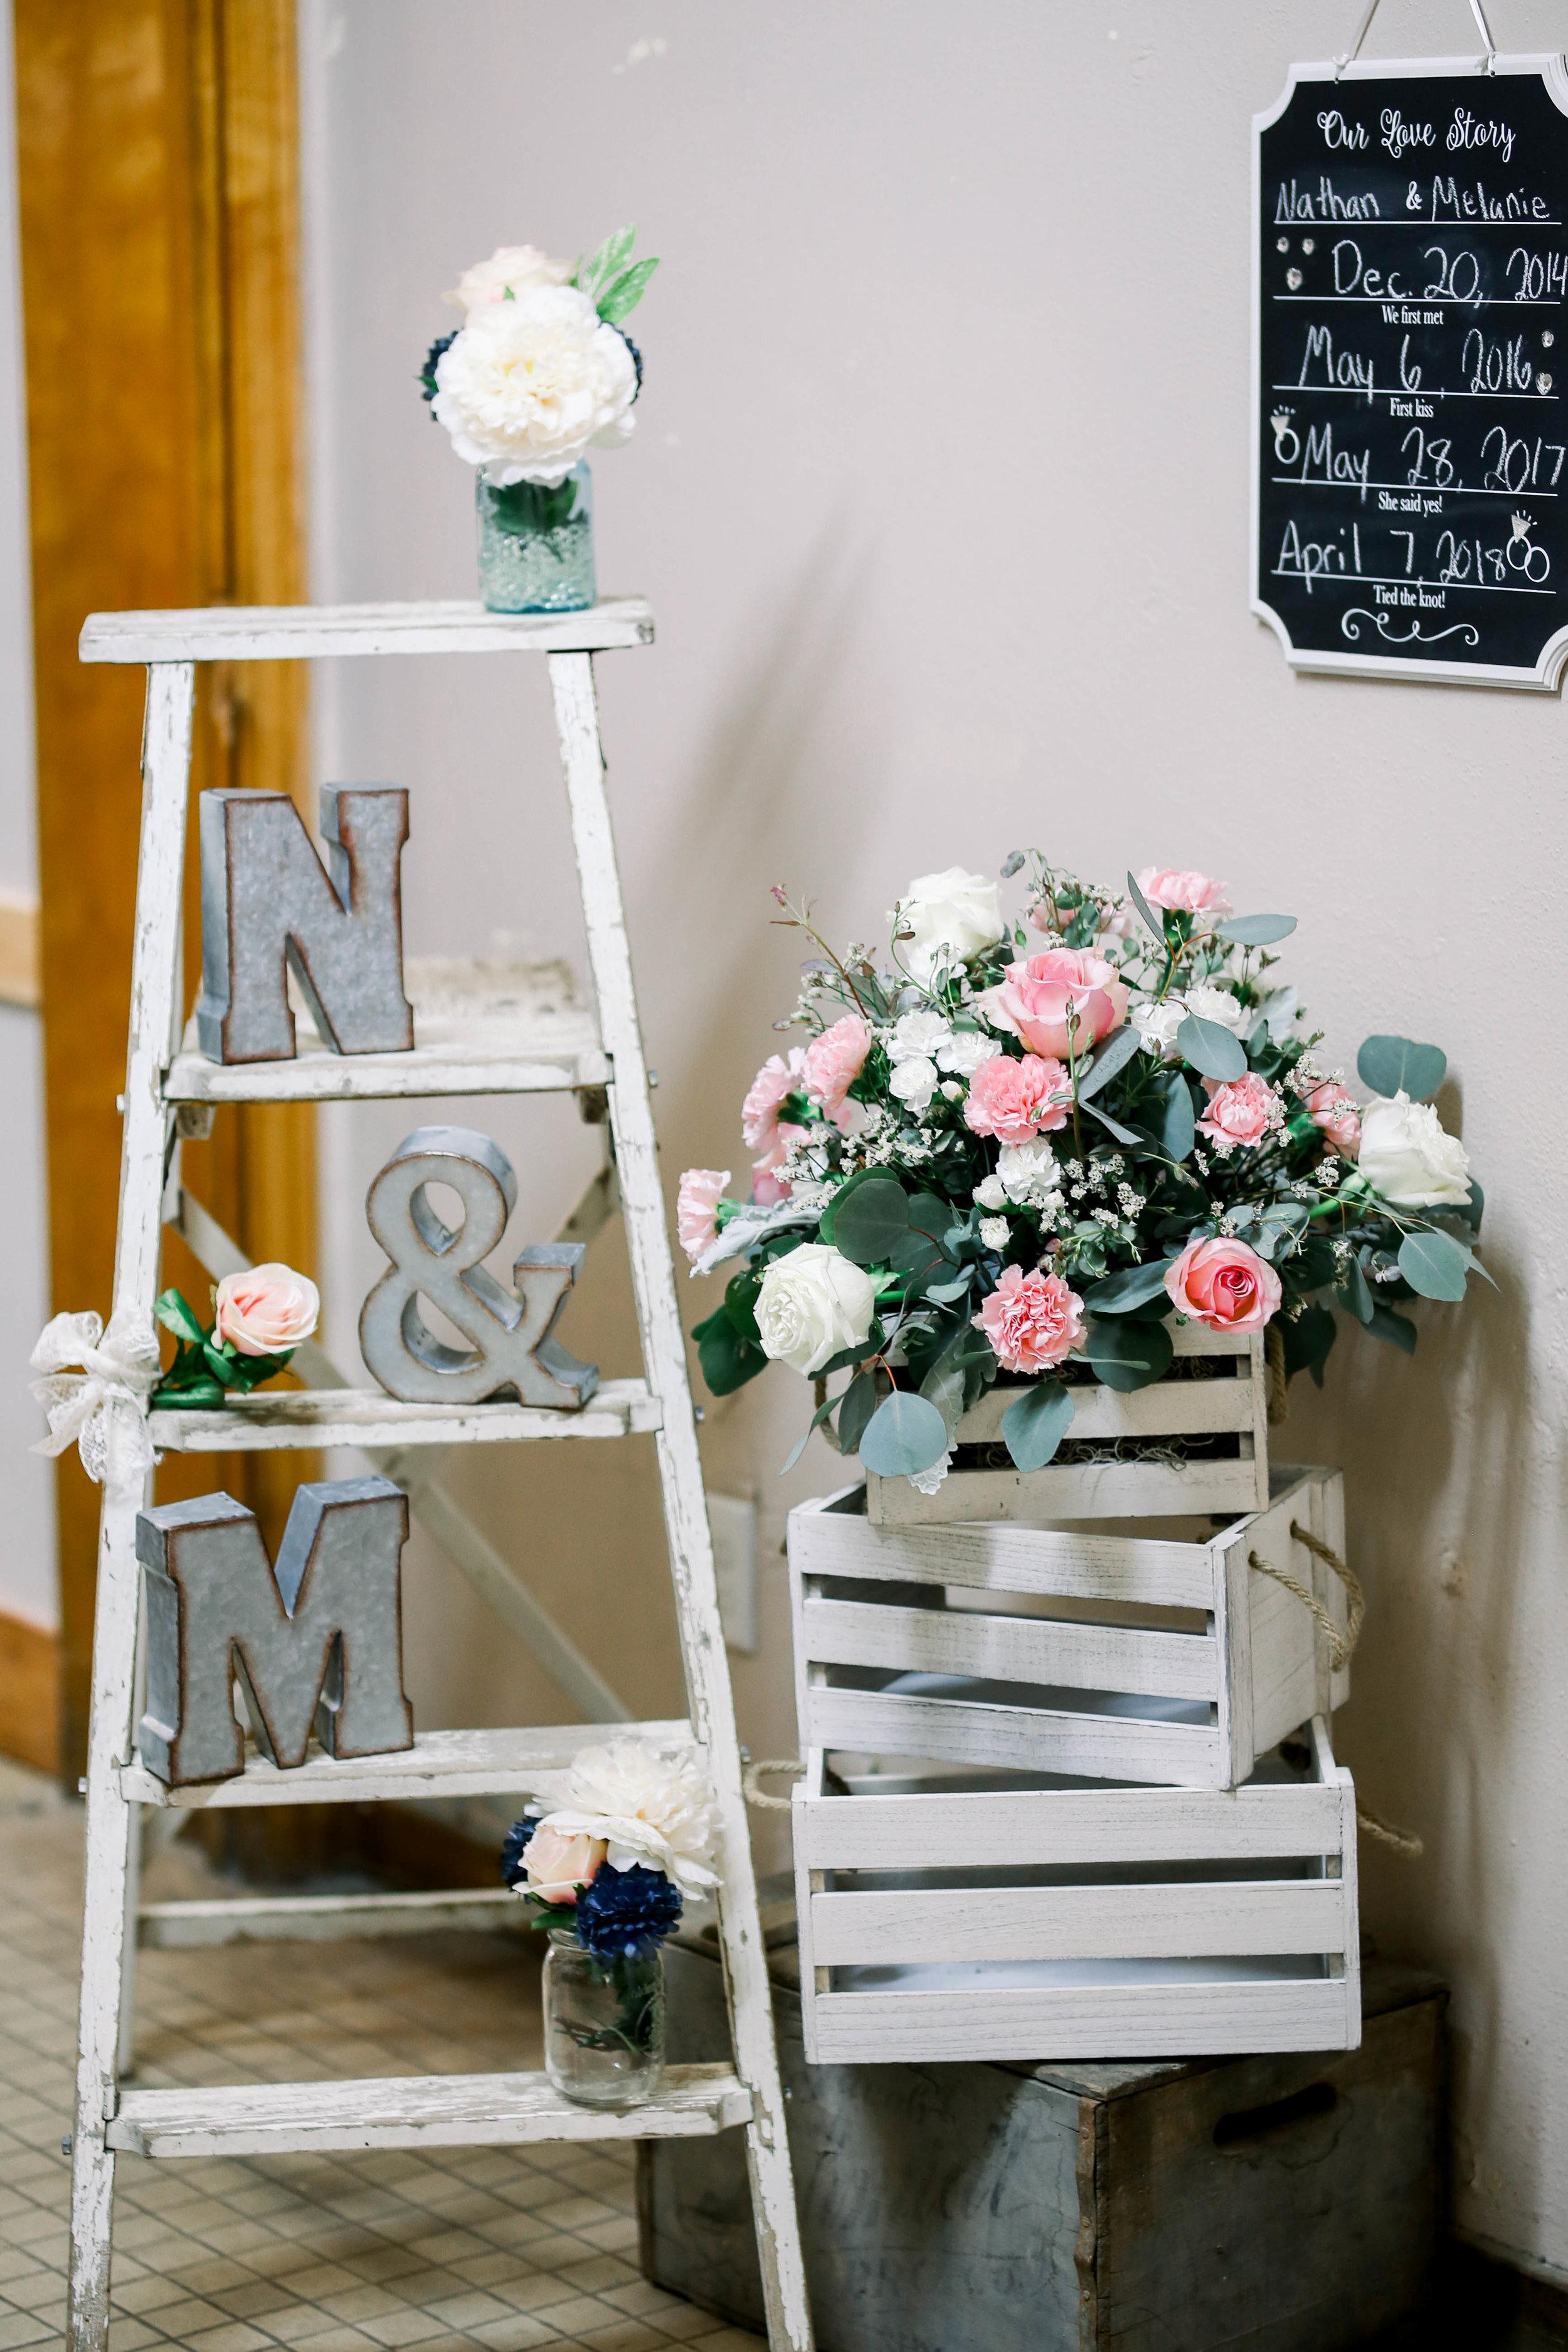 Nathan and Melanie's Wedding (624 of 807).jpg